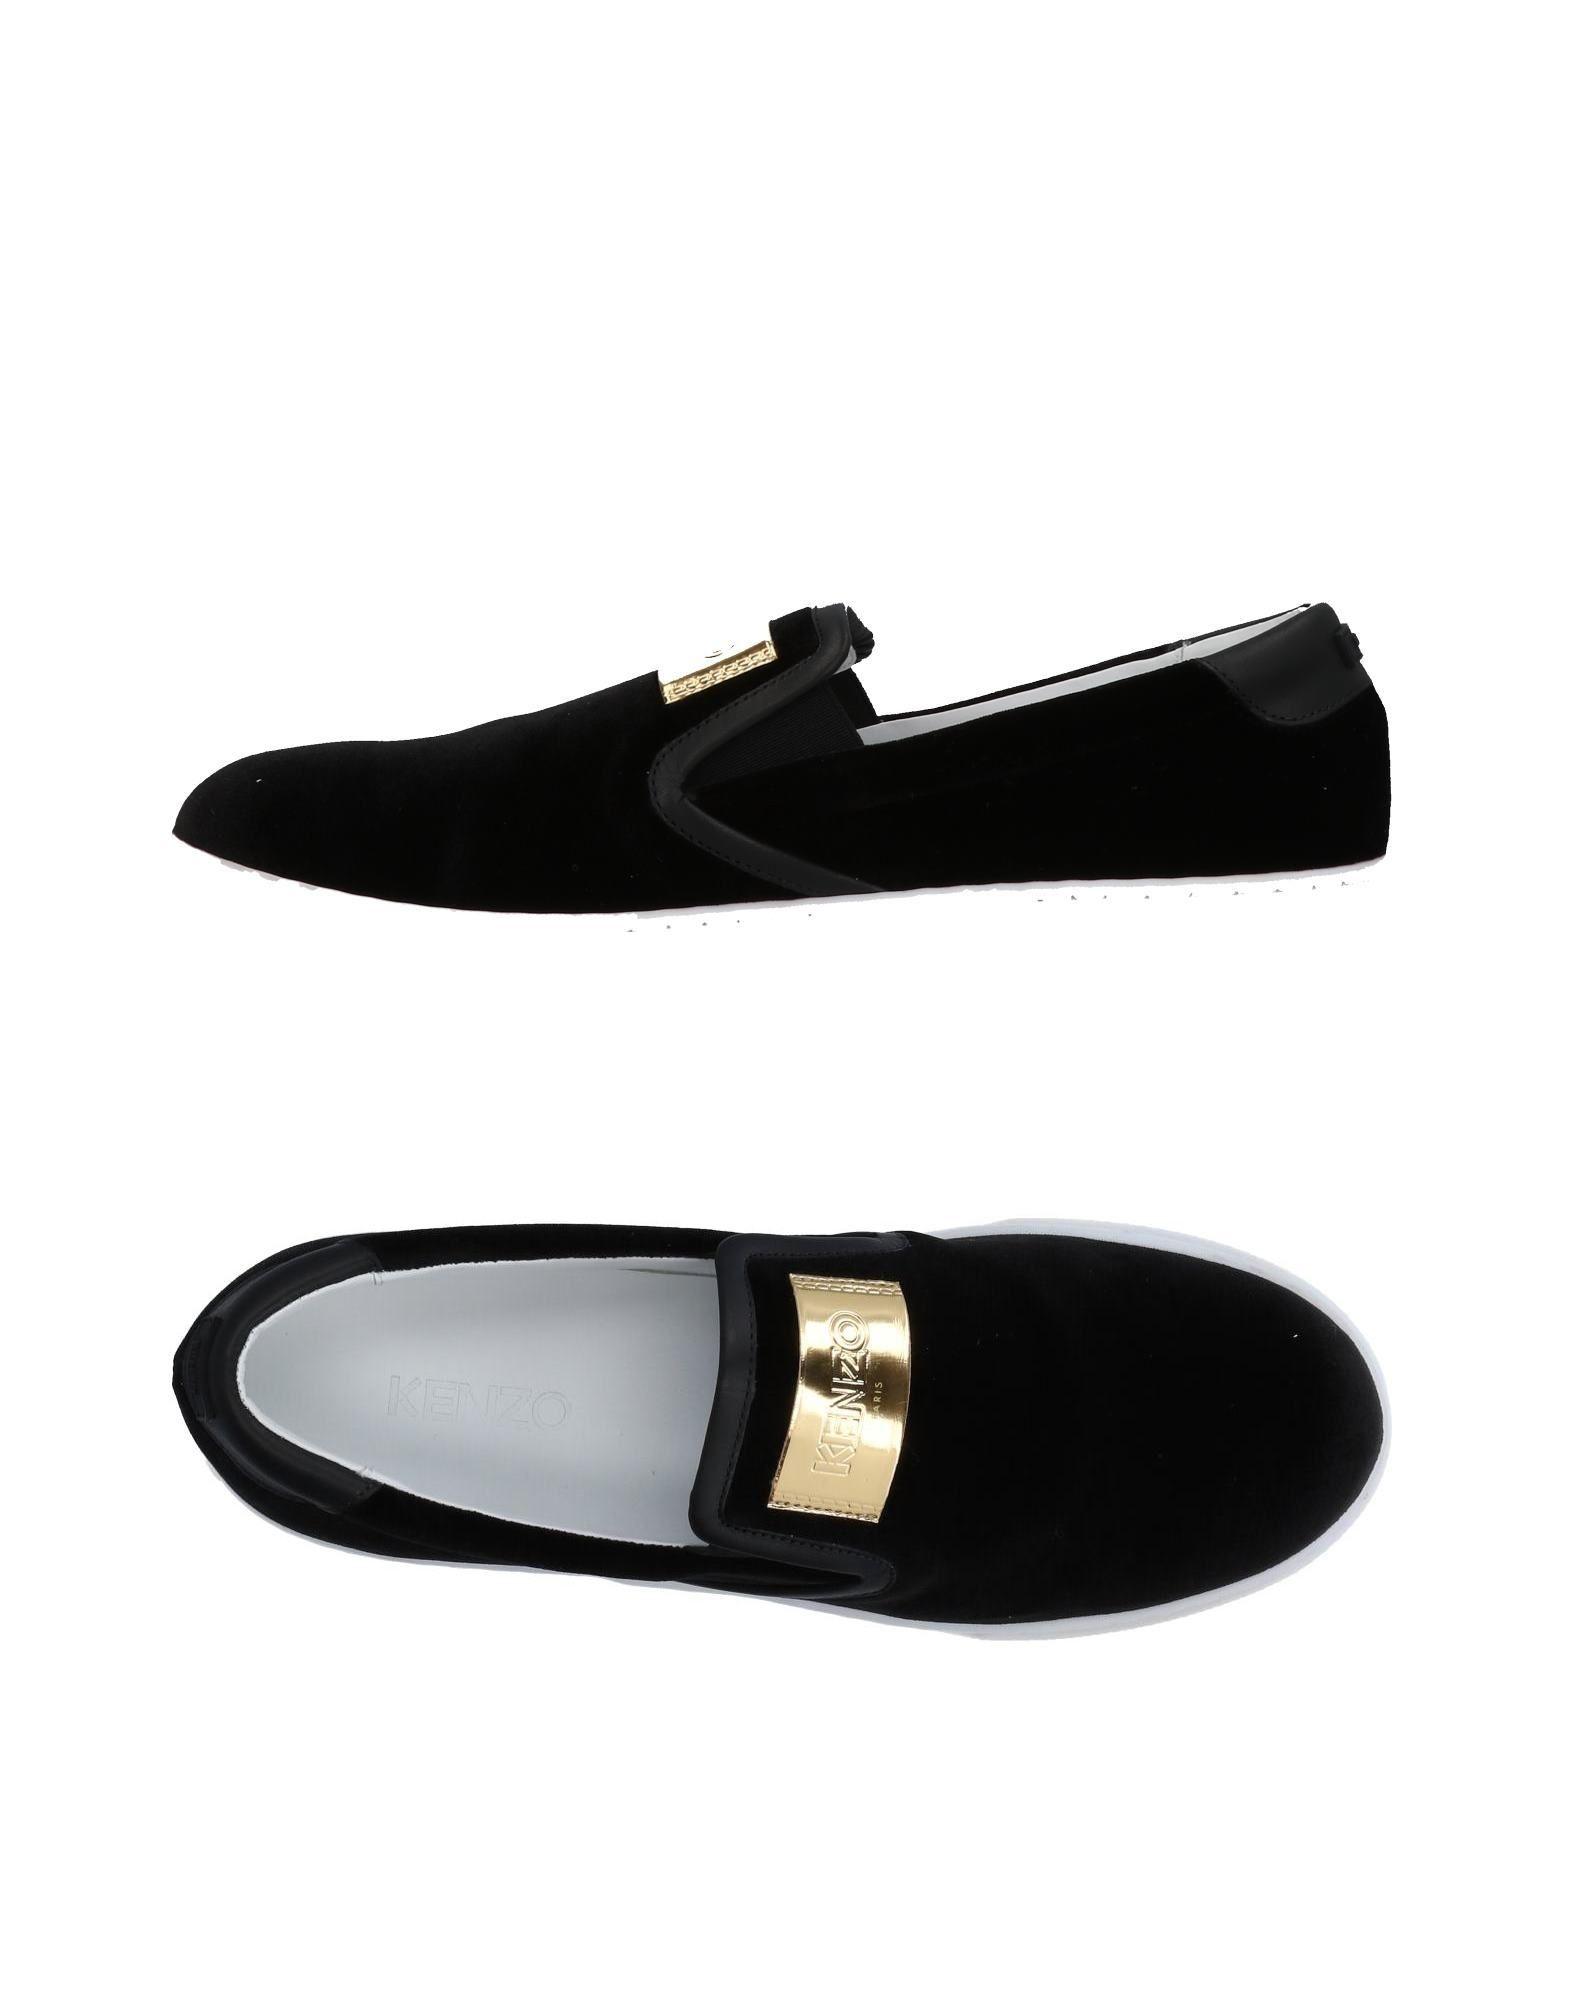 Moda 11435355CE Sneakers Kenzo Donna - 11435355CE Moda 0a7975